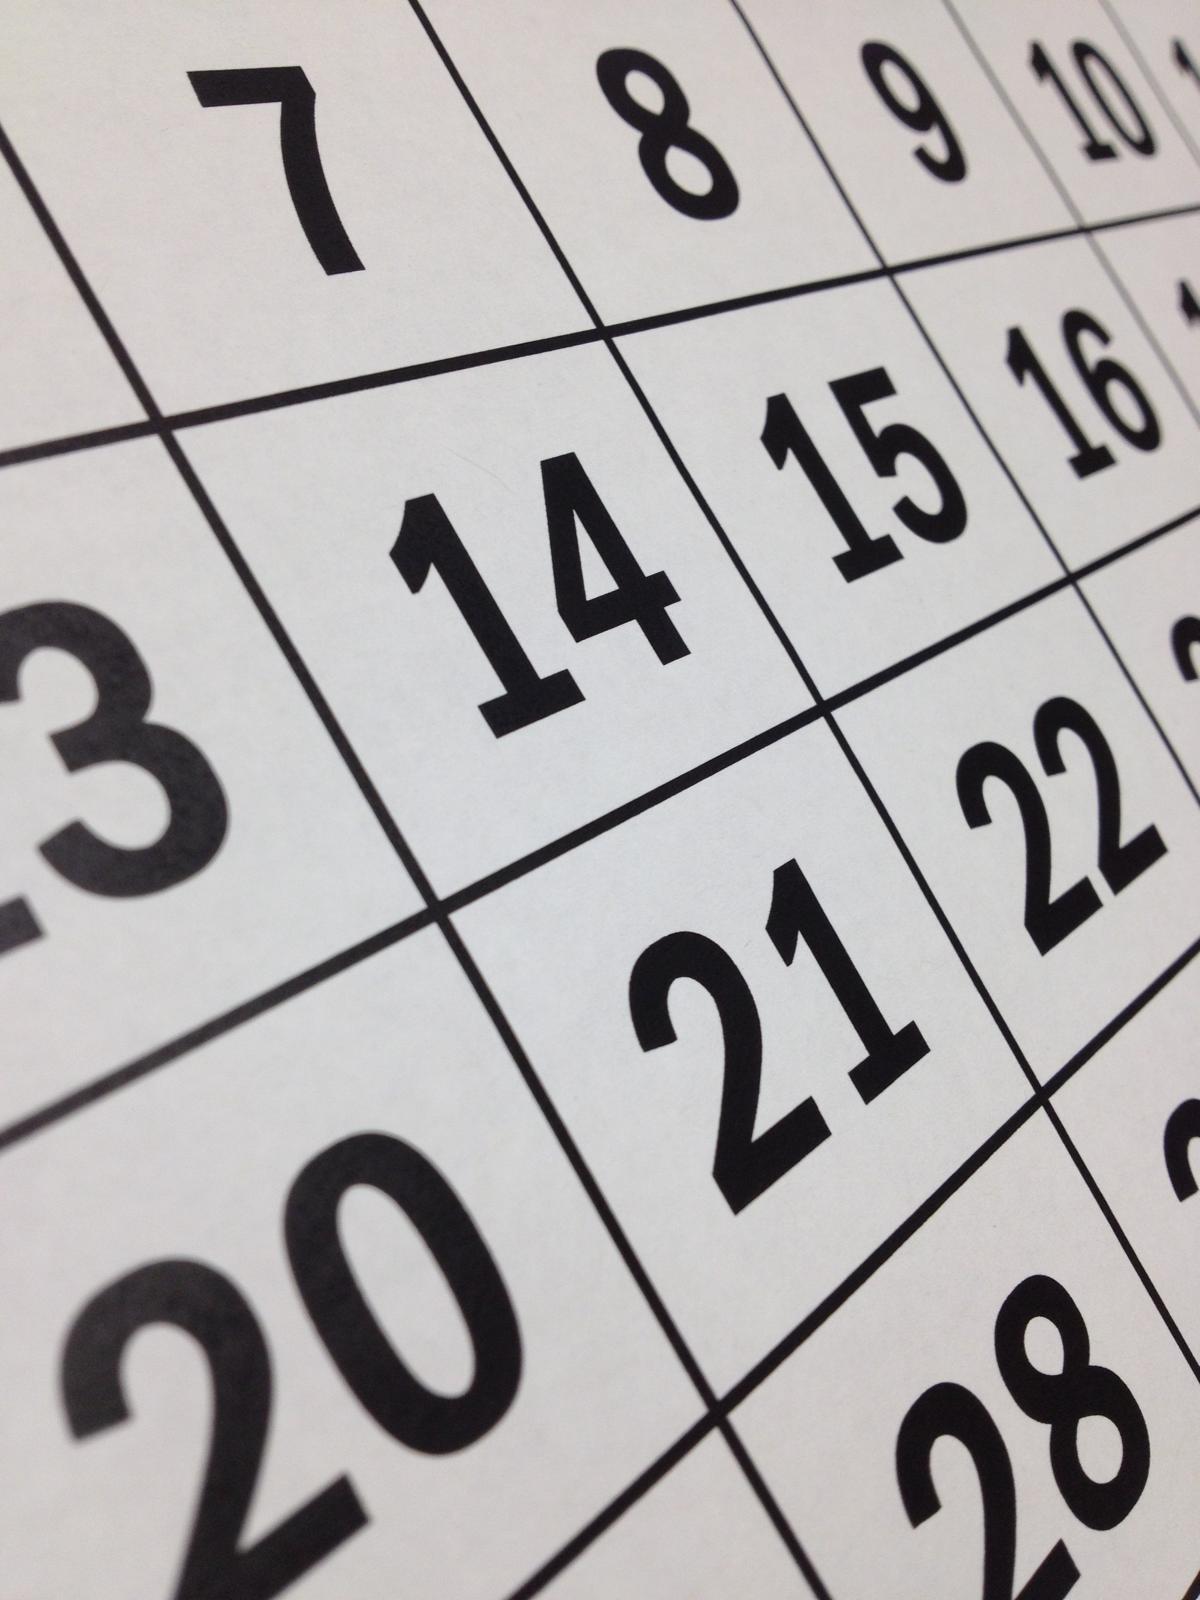 Evangelische Jugend Öschelbronn Jugendarbeit Event Veranstaltung Kalender